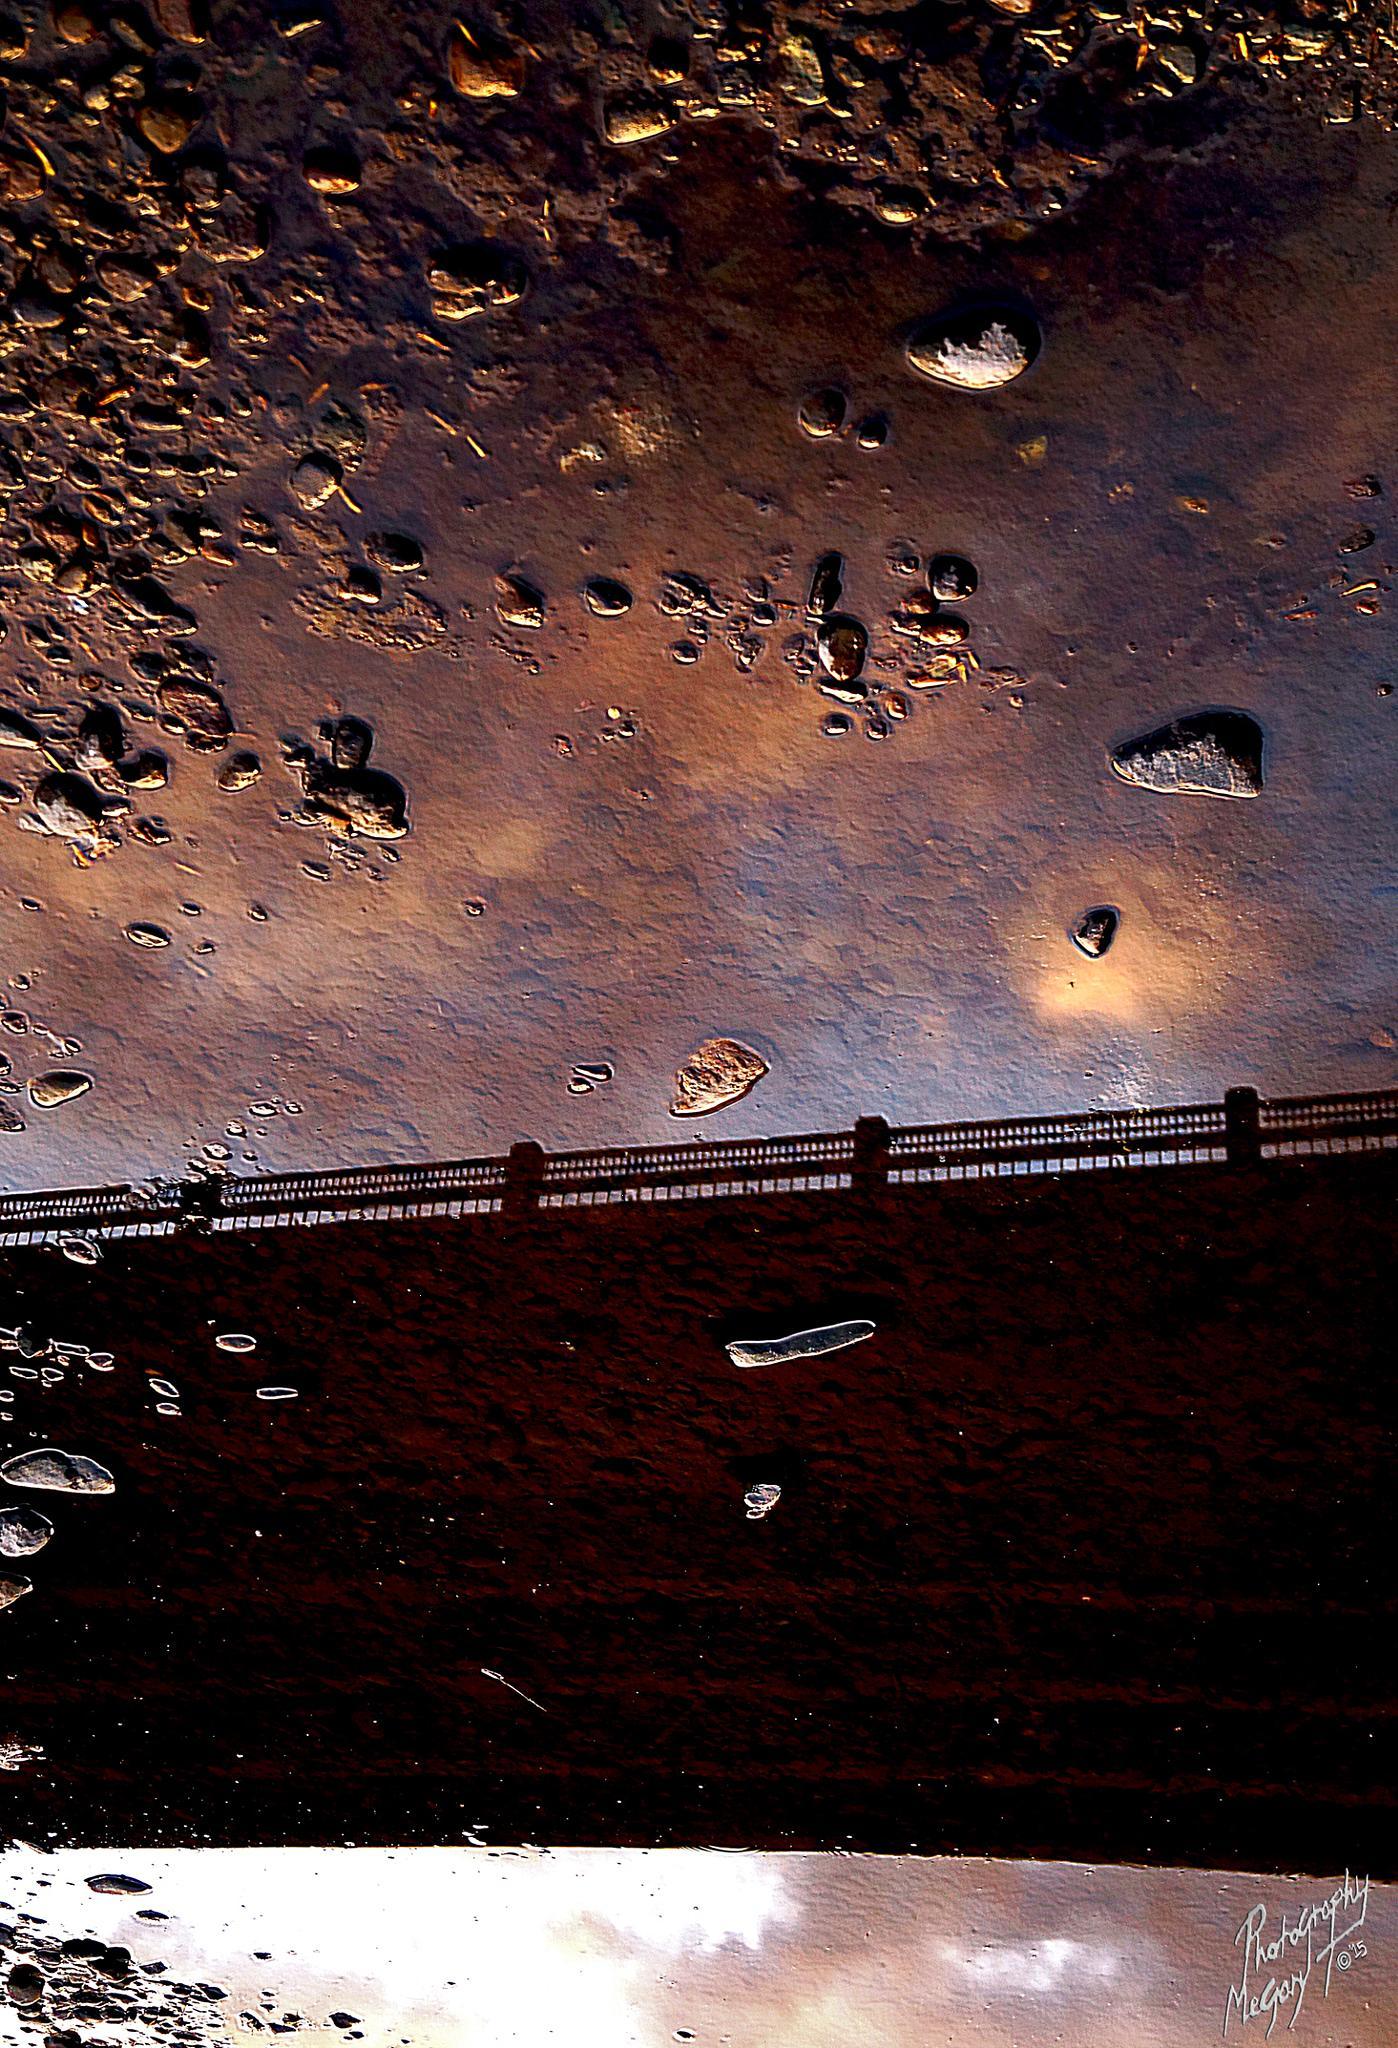 Sky on the Rocks II by MegaryT [[°©;]